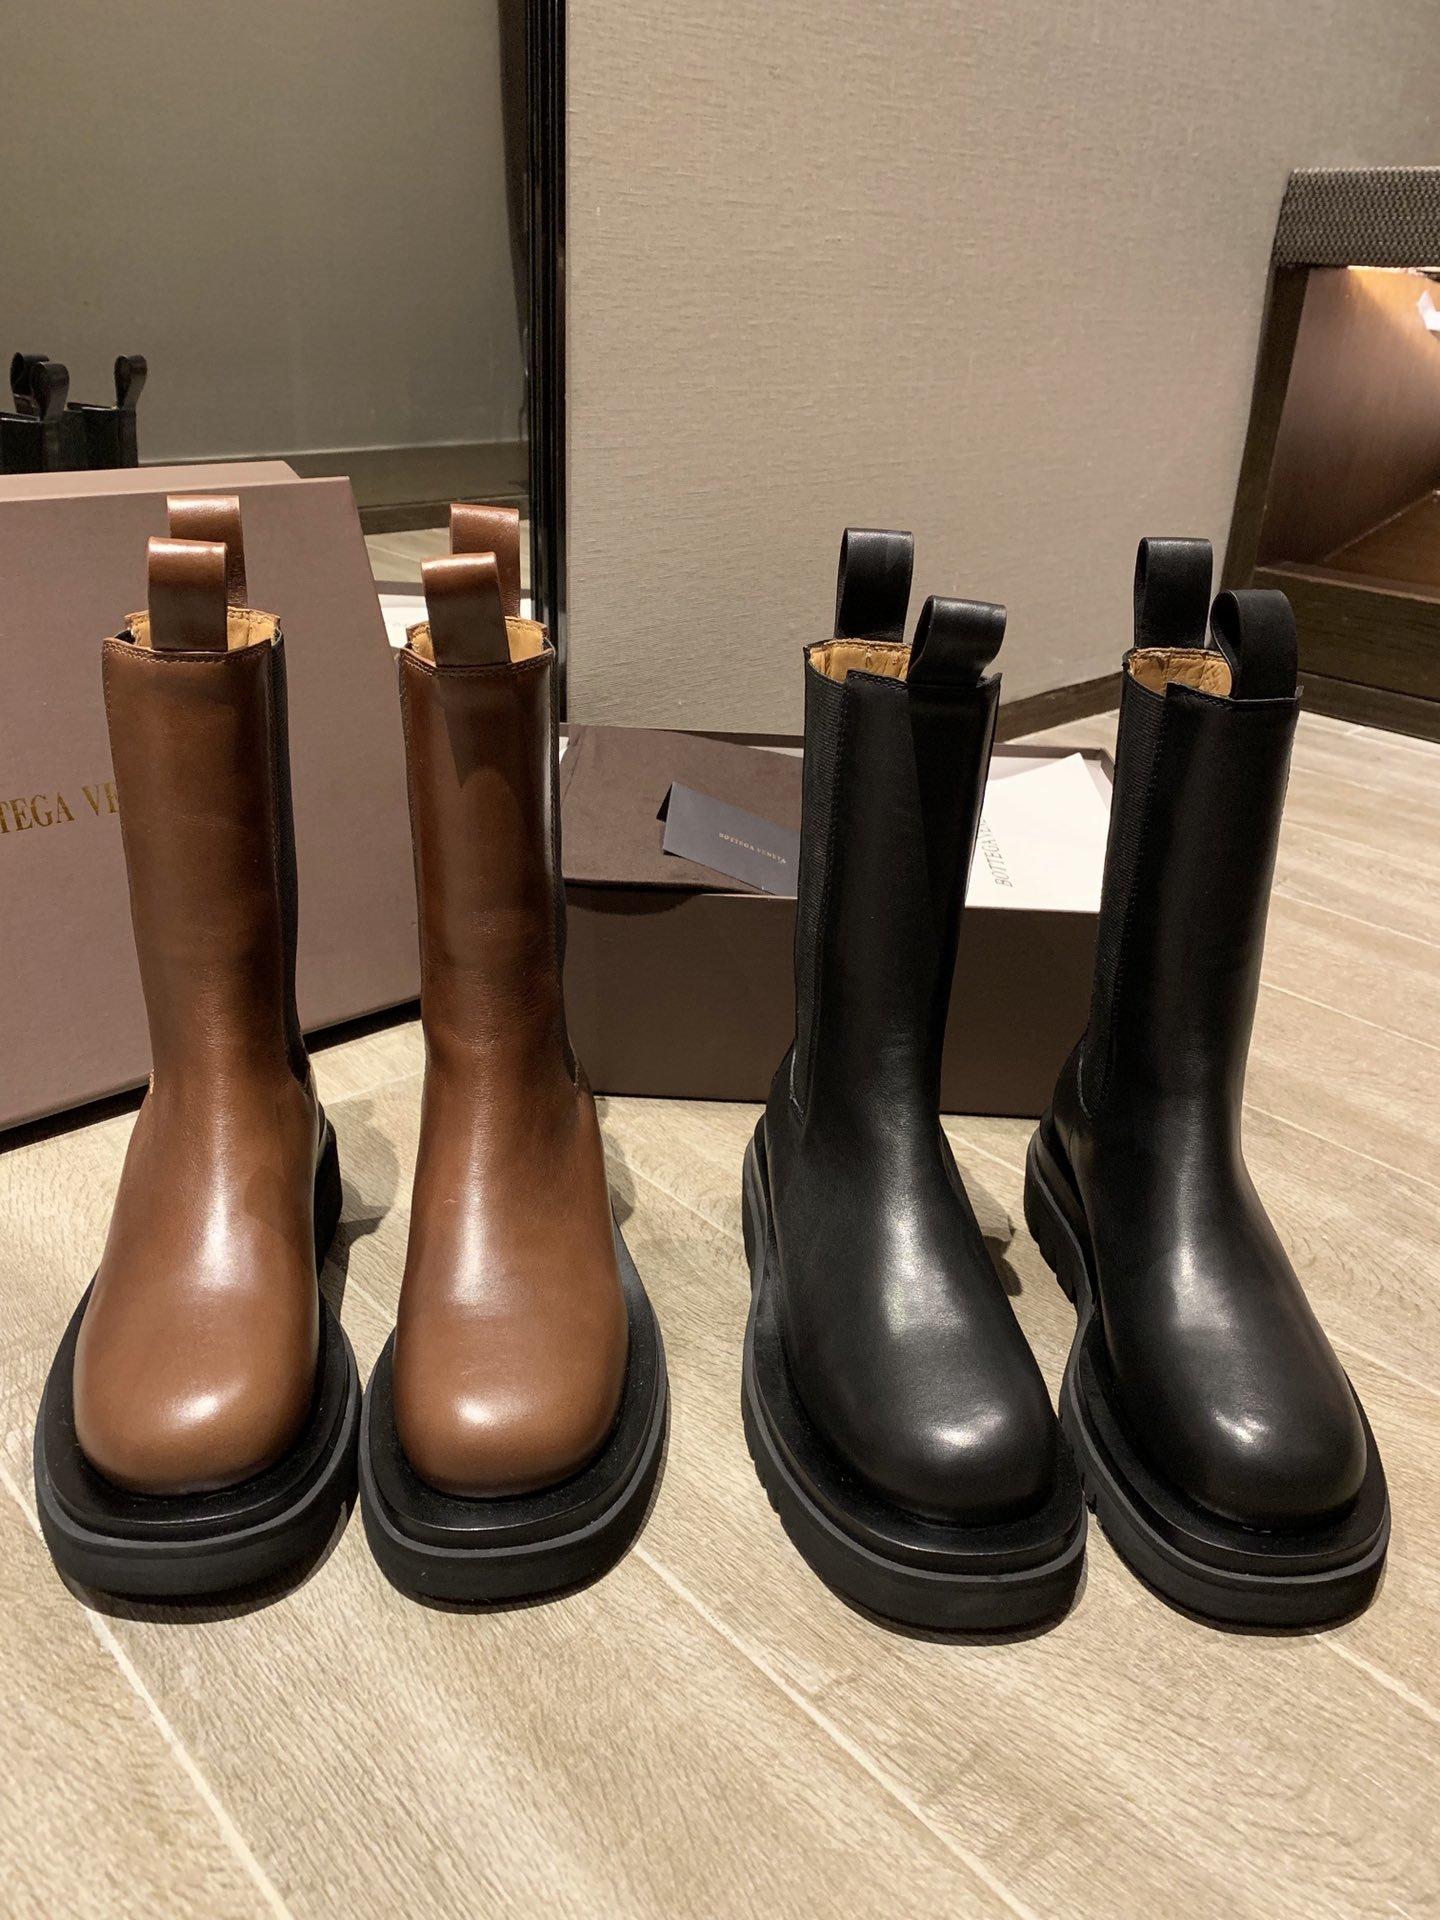 BV专柜新款中筒靴势不可挡的爆款上脚